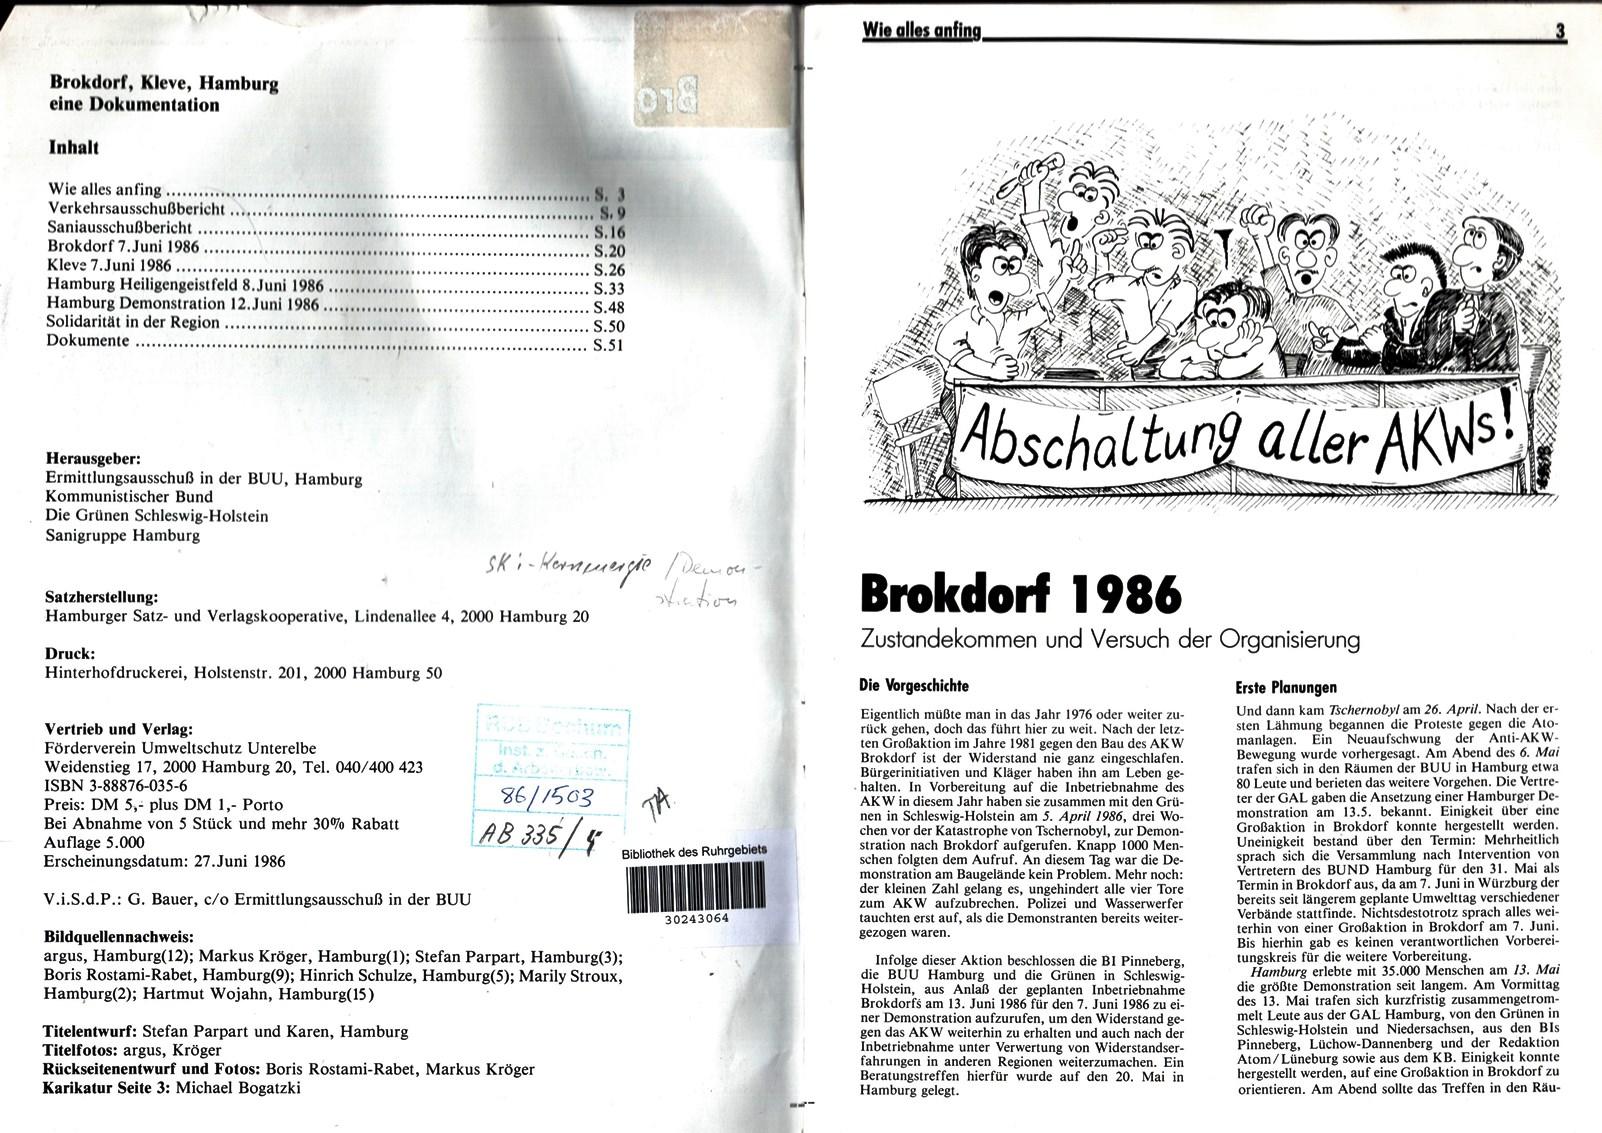 NOR_AKW_1986_Brokdorf_Kleve_Hamburg_002